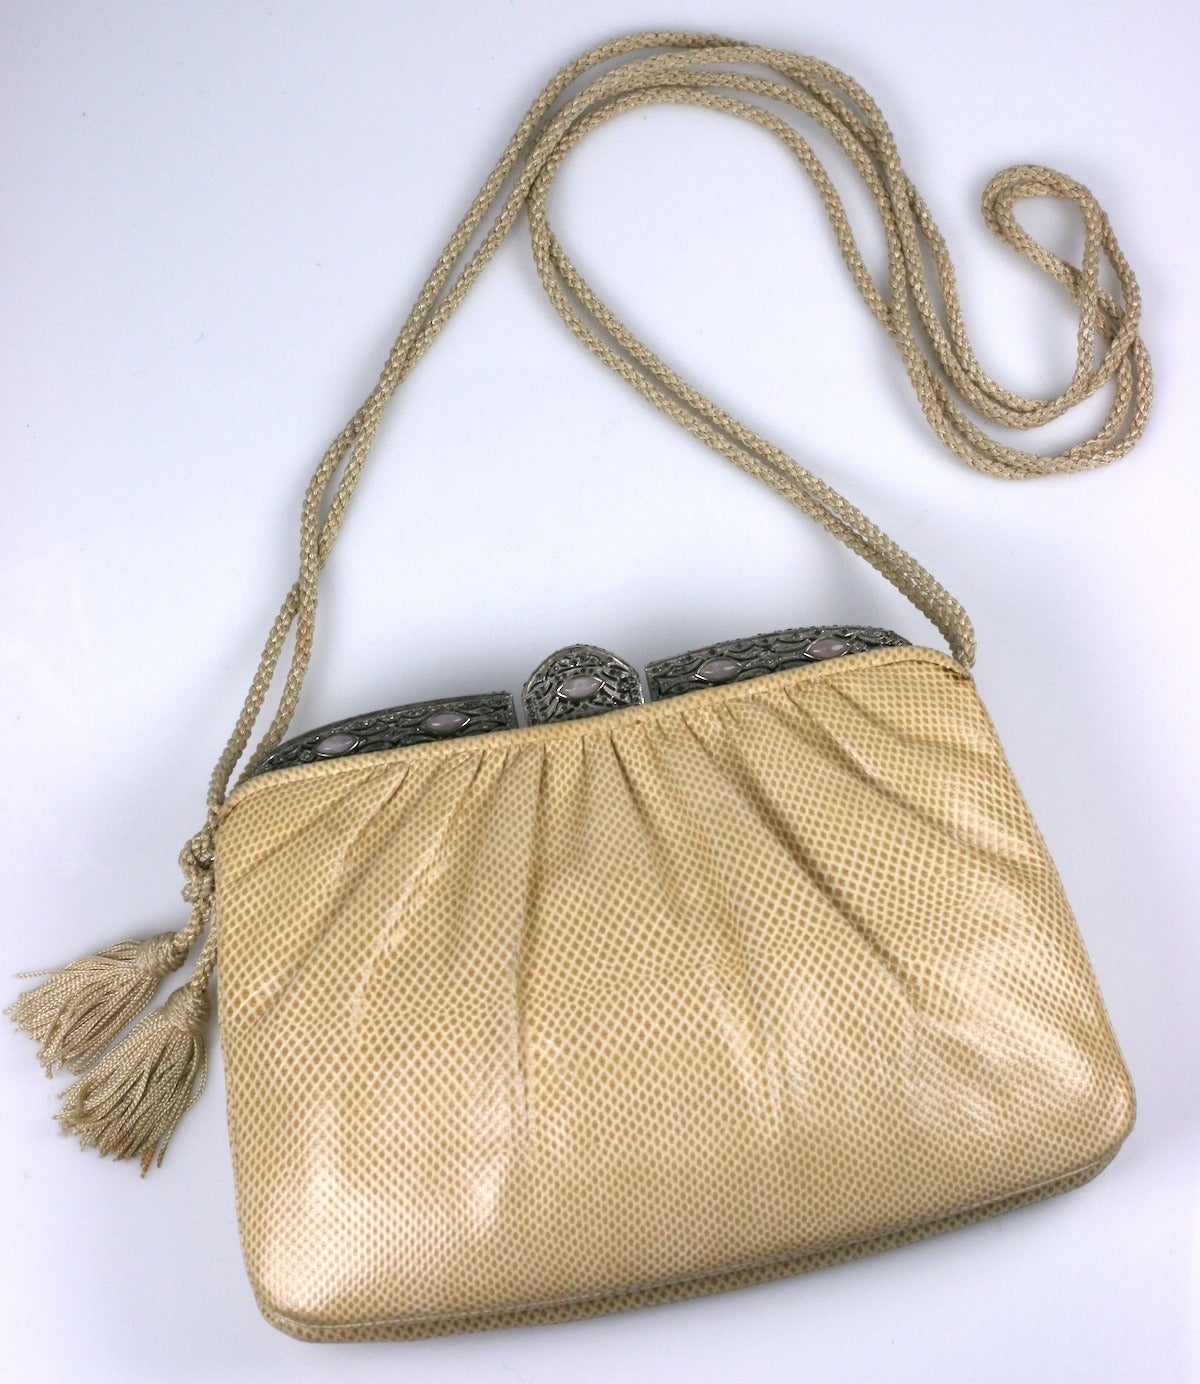 Judith Leiber Snakeskin and Rose Quartz Bag image 2